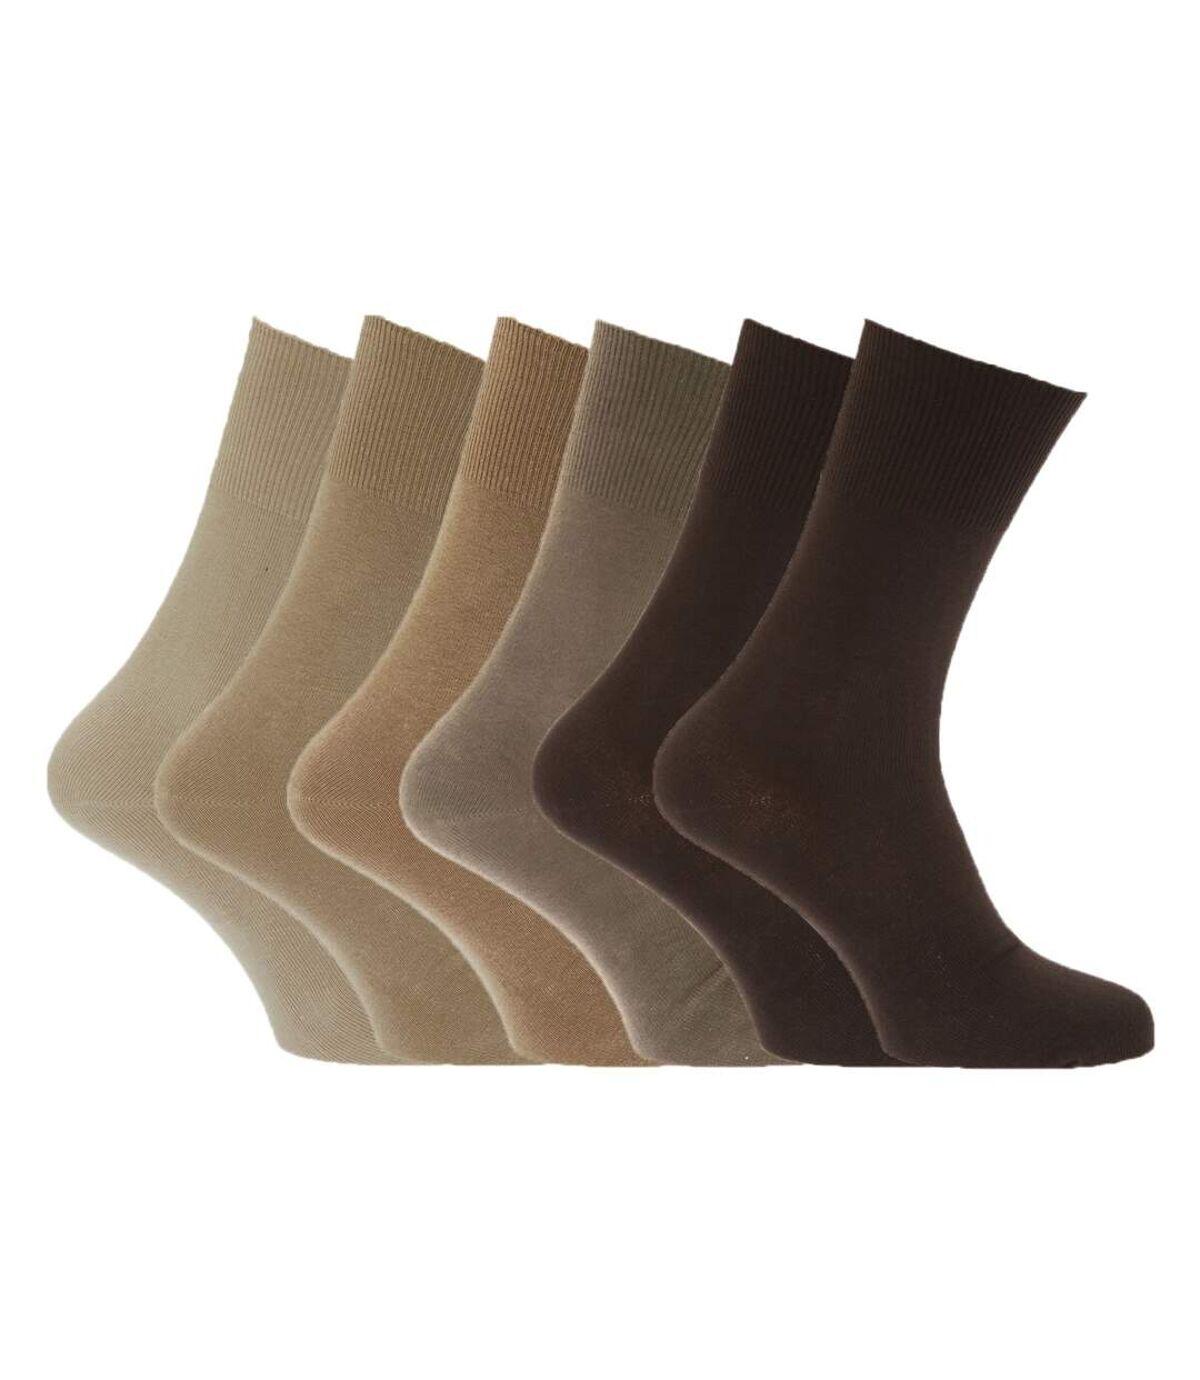 Mens Stay Up Non Elastic Diabetic Socks (Pack Of 6) (Shades Of Brown) - UTMB250